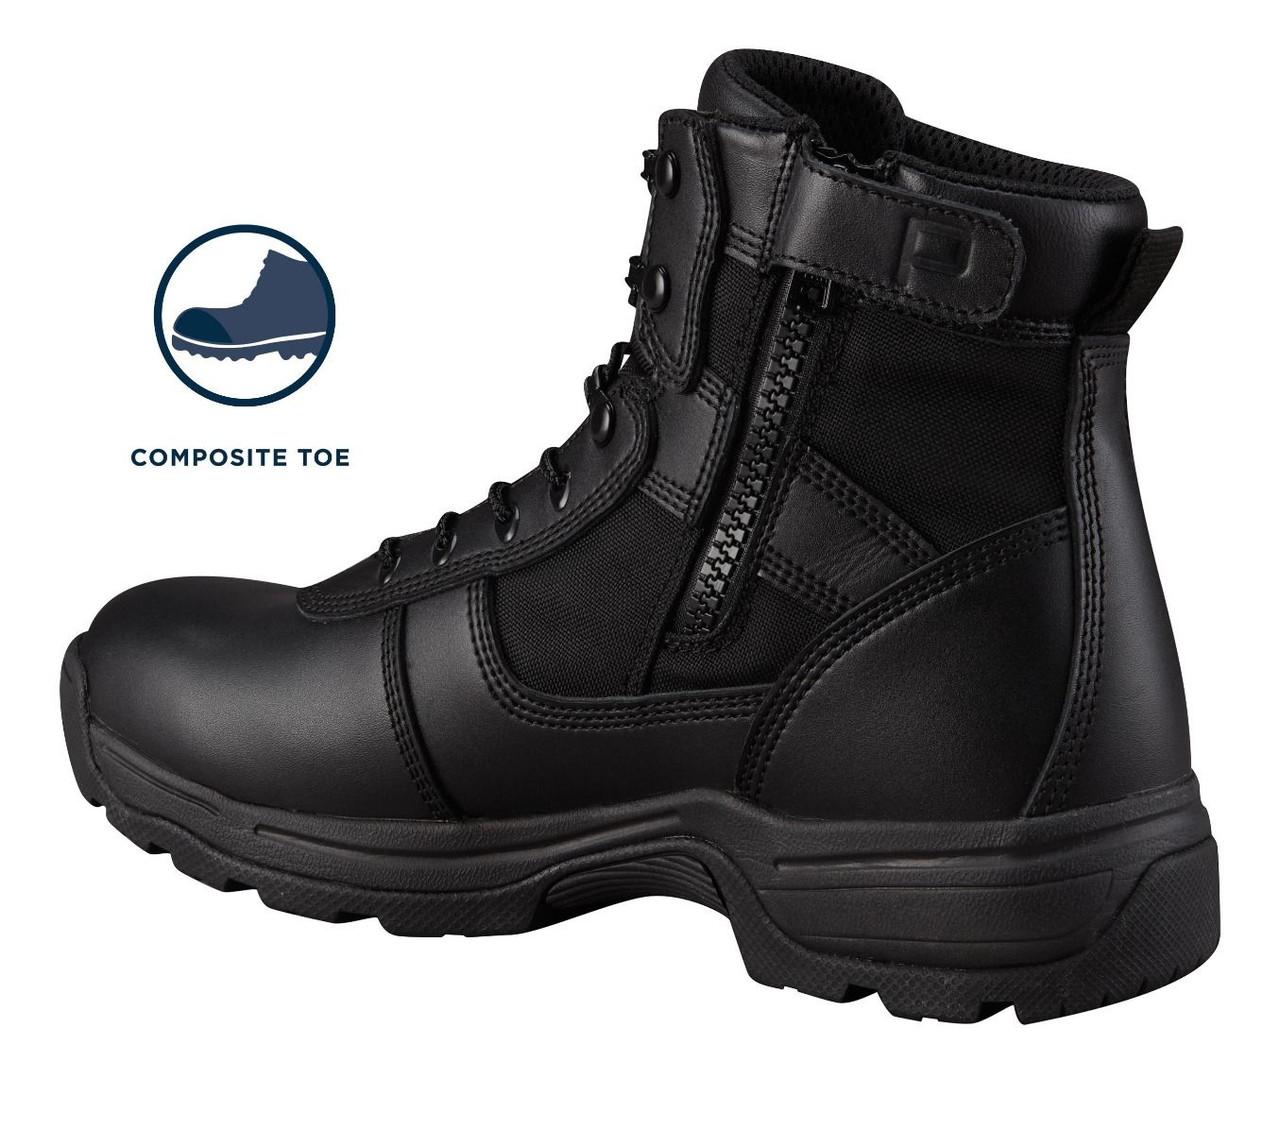 "Propper Series 100® 6"" Side Zip Boot Waterproof Composite Toe F4528"